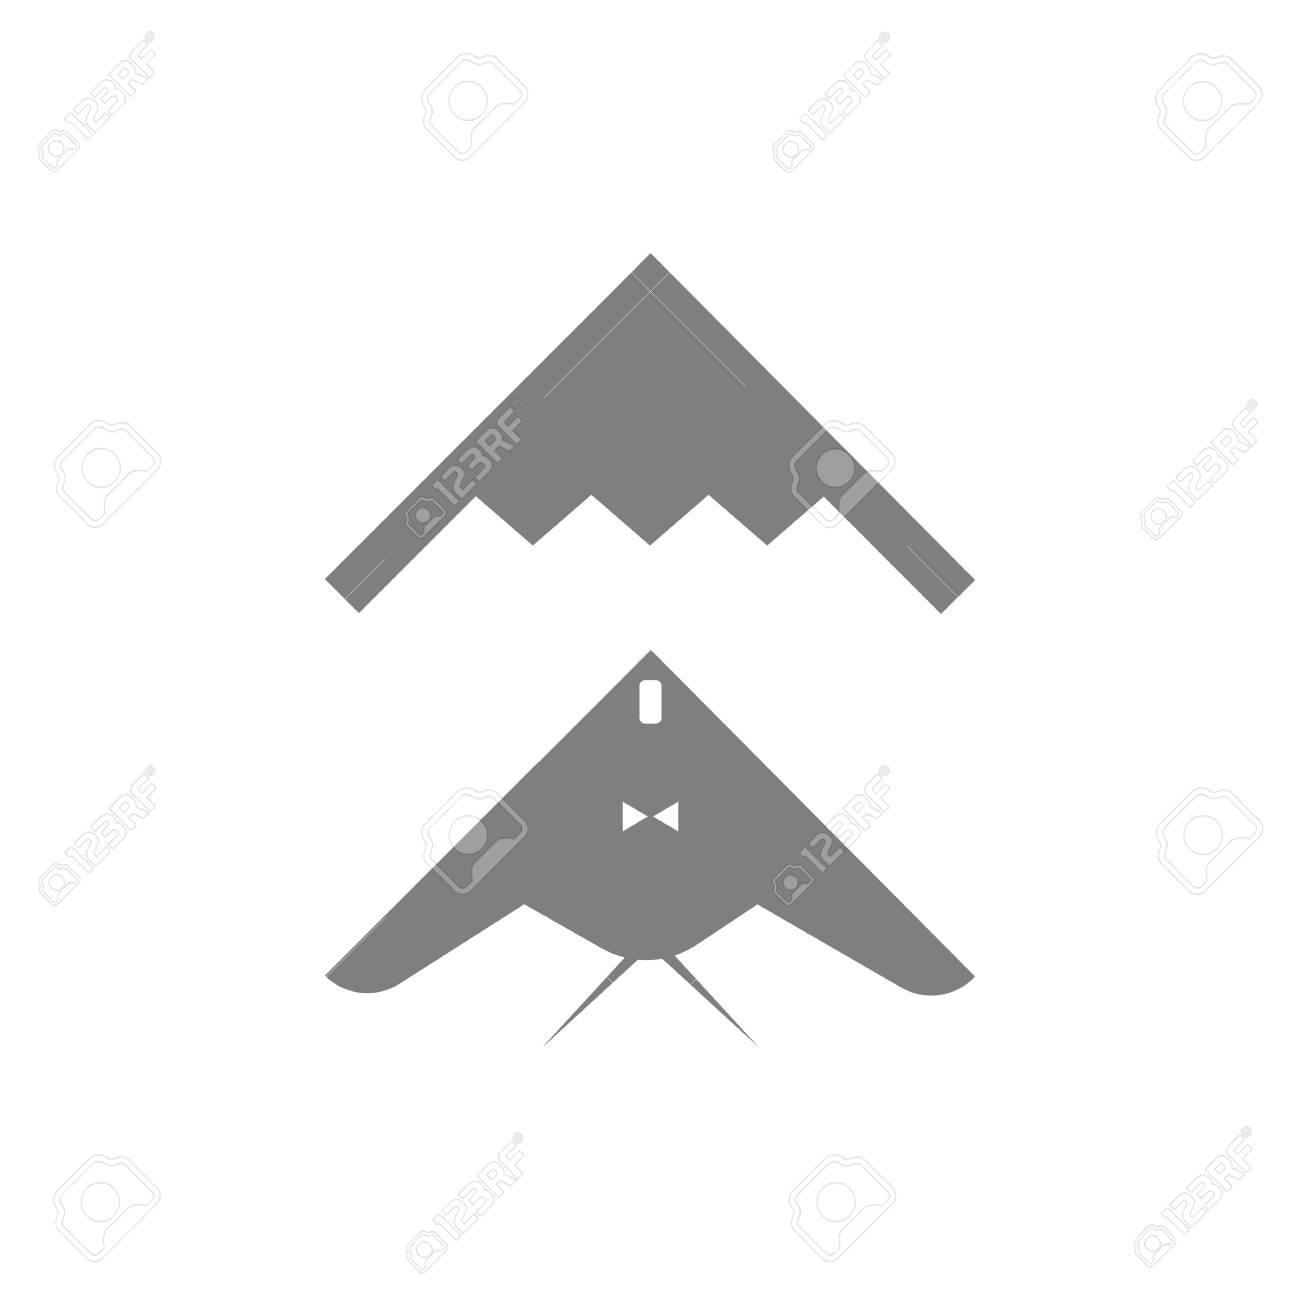 Stealth Bomber Icon On White Background Illustration Royalty 1300x1300